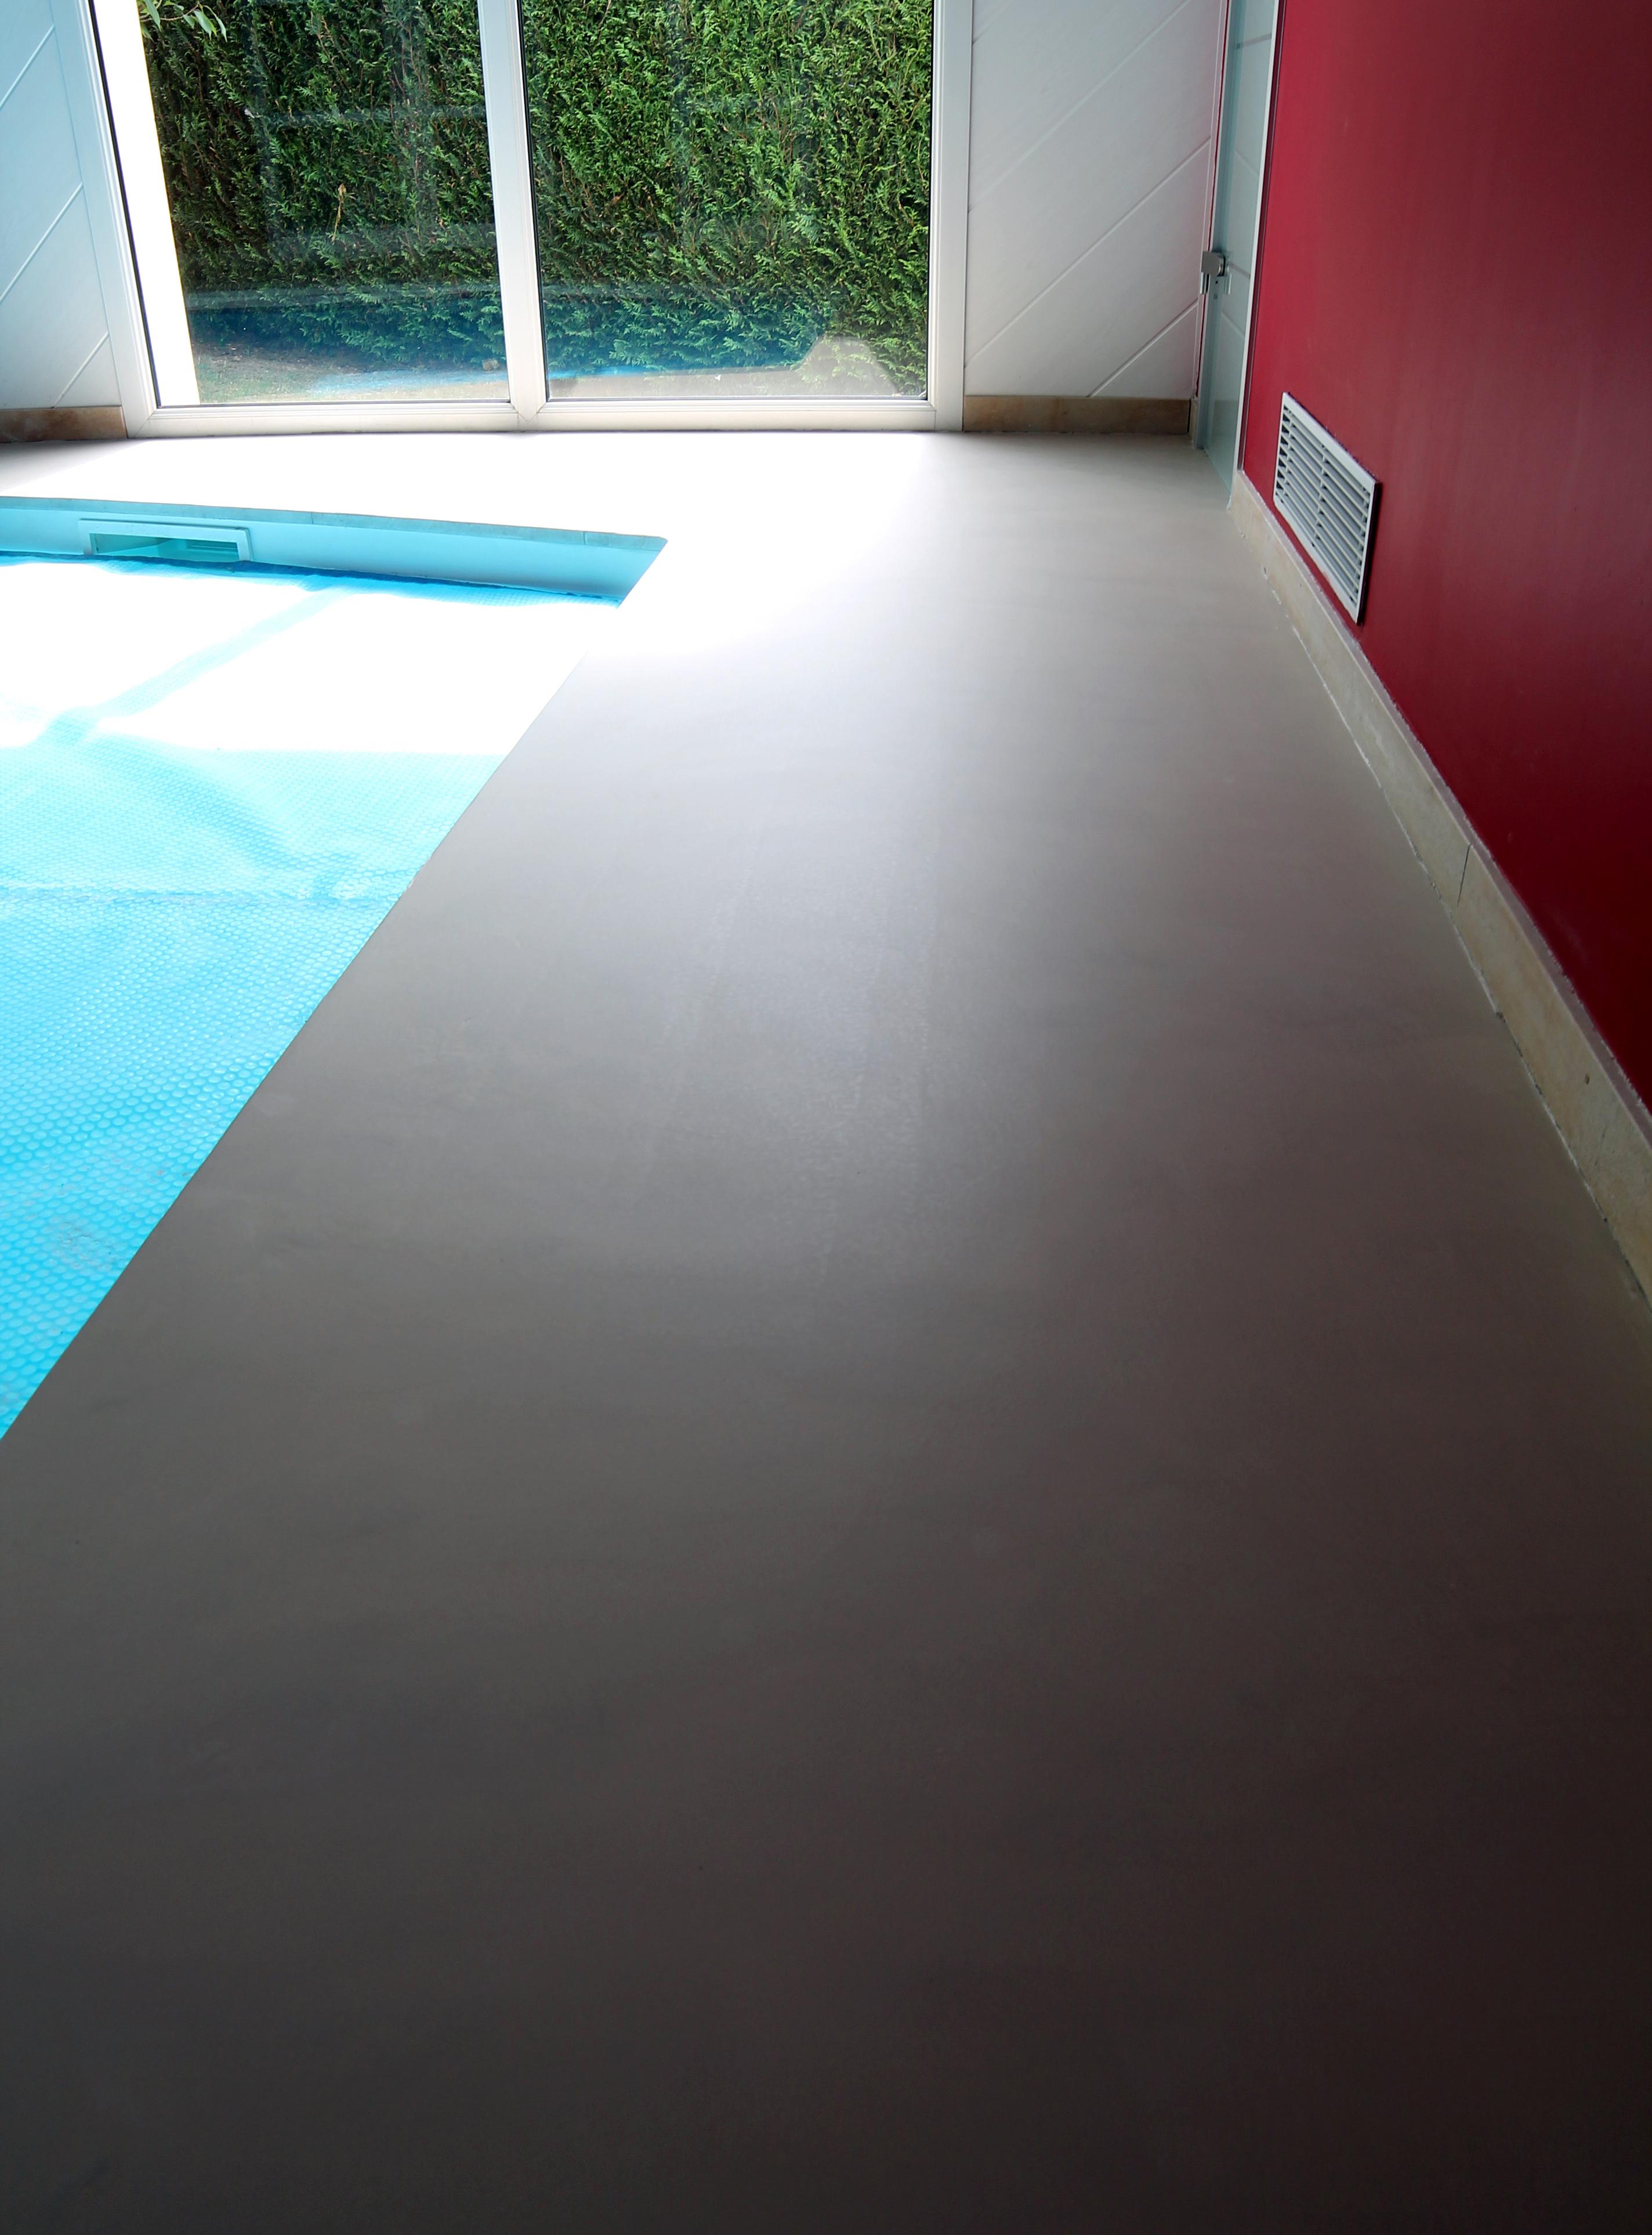 Terrasse piscine beton cire Revetement piscine beton cire